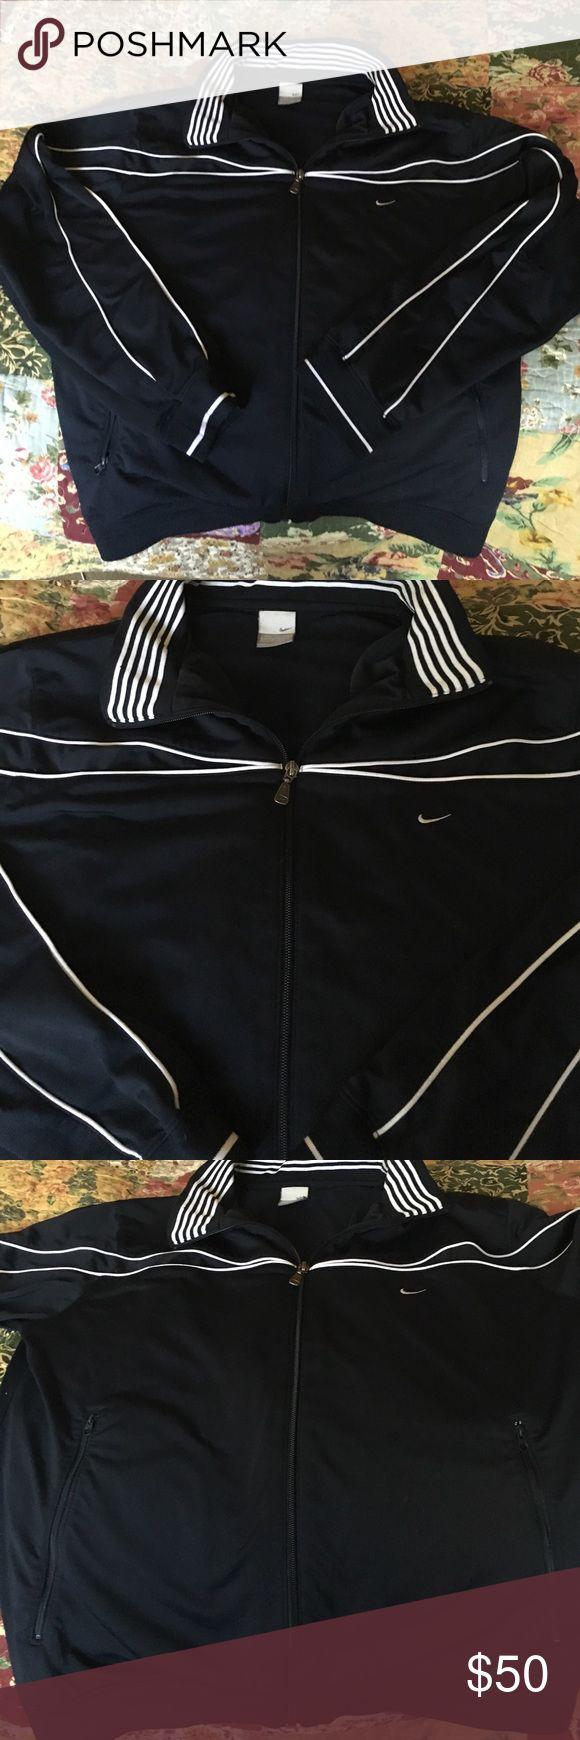 NIKE SPORTS JACKET NIKE SPORTS JACKET. Looks great! Nike Jackets & Coats